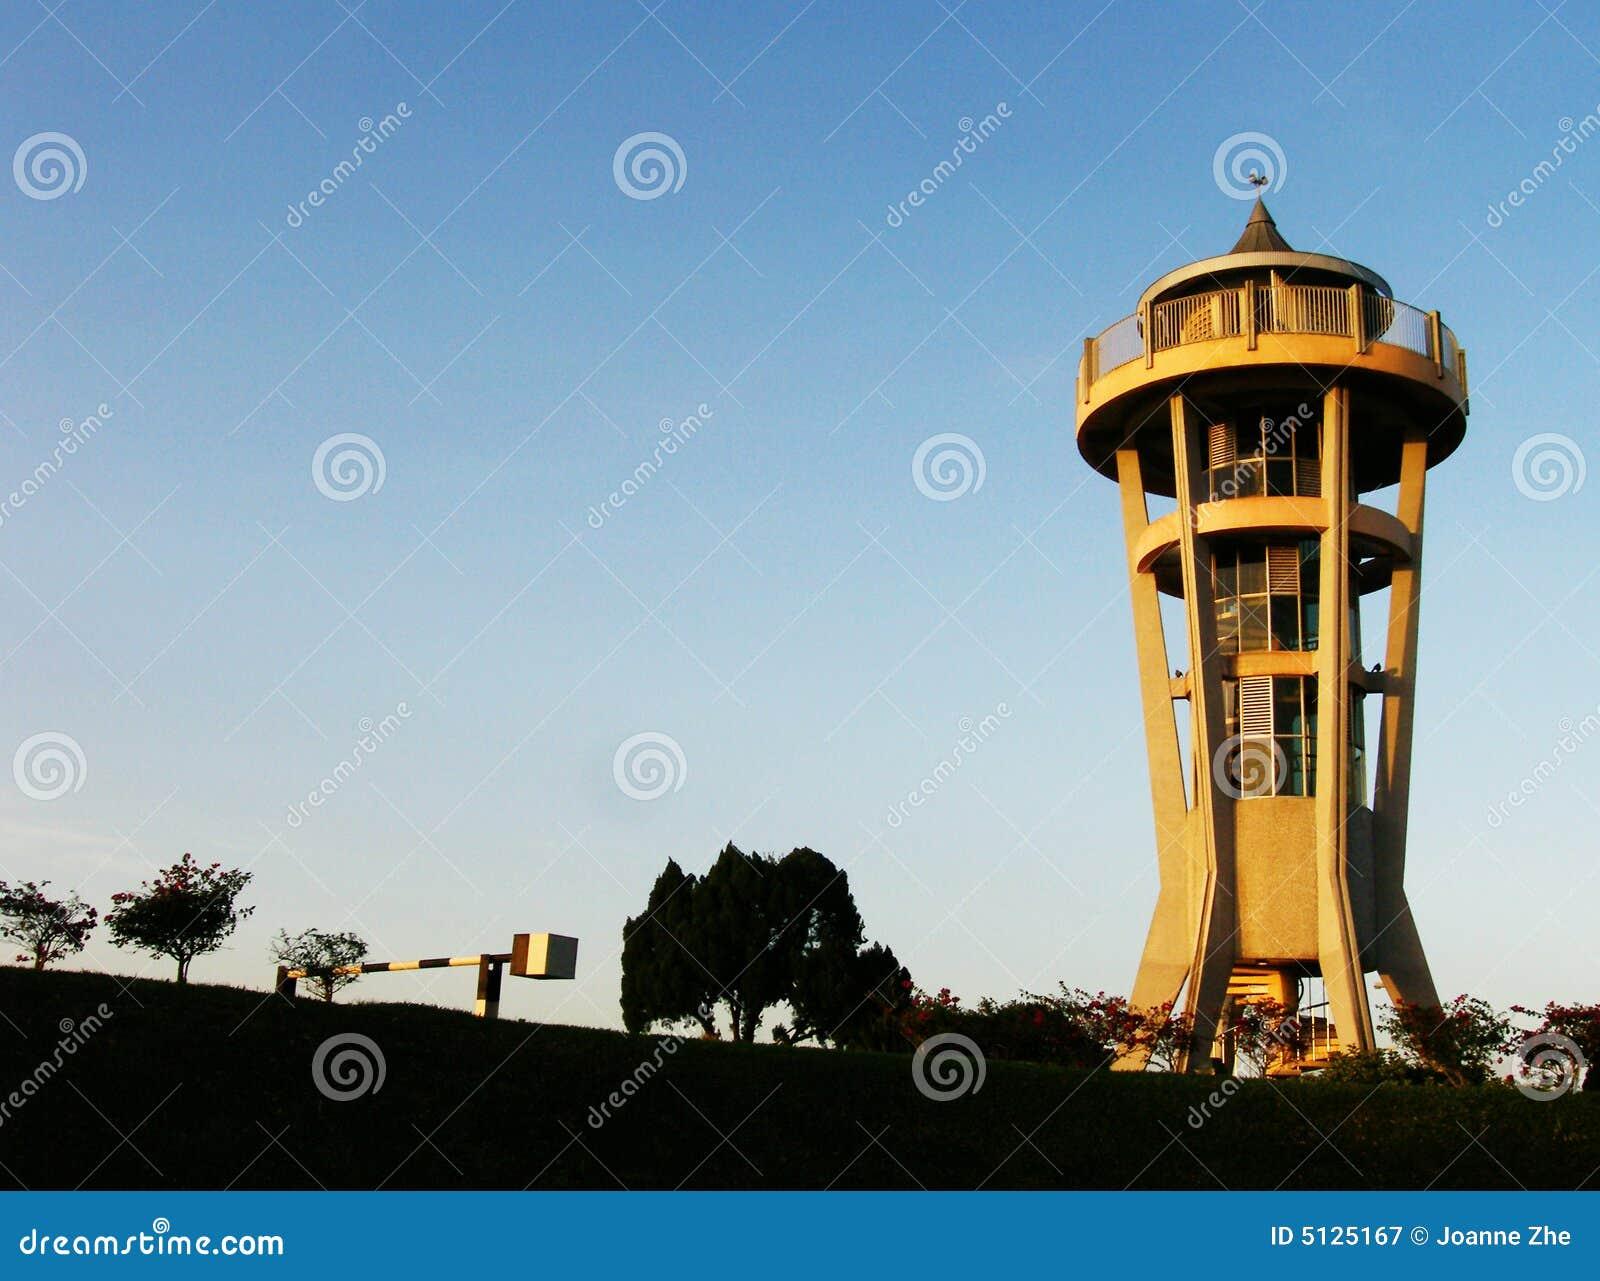 Seletar Reservoir Lookout Tower Royalty Free Stock